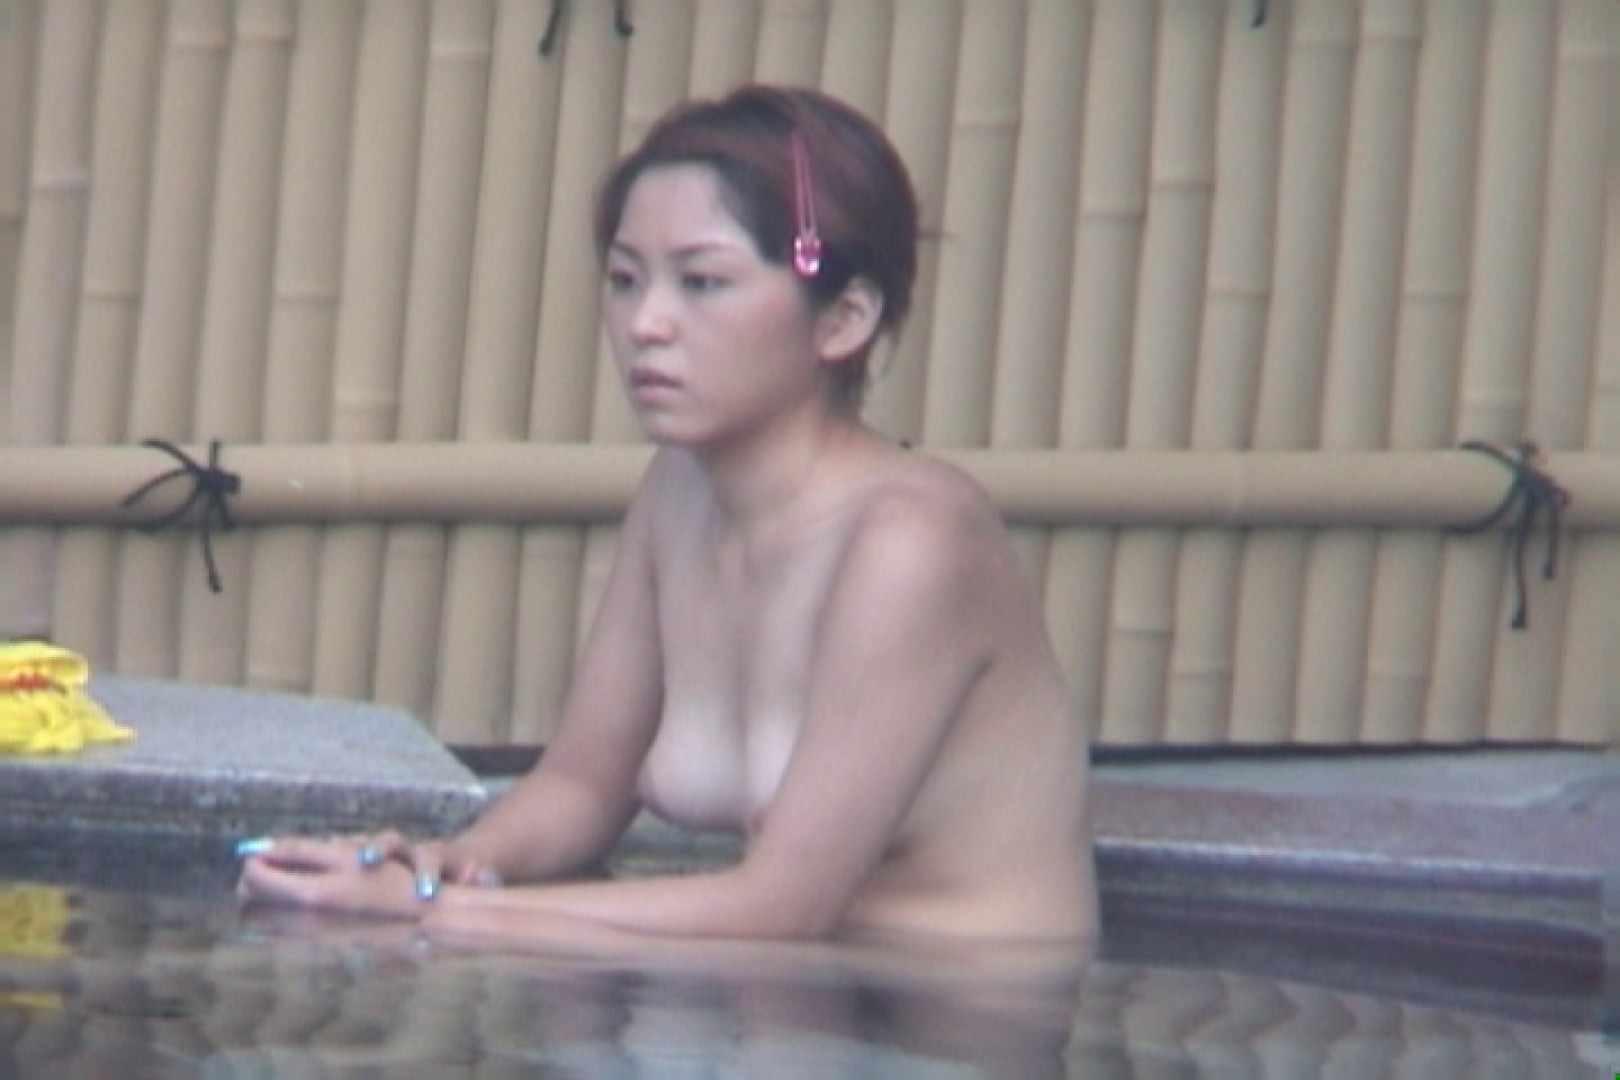 Aquaな露天風呂Vol.574 盗撮 | OLセックス  97画像 64